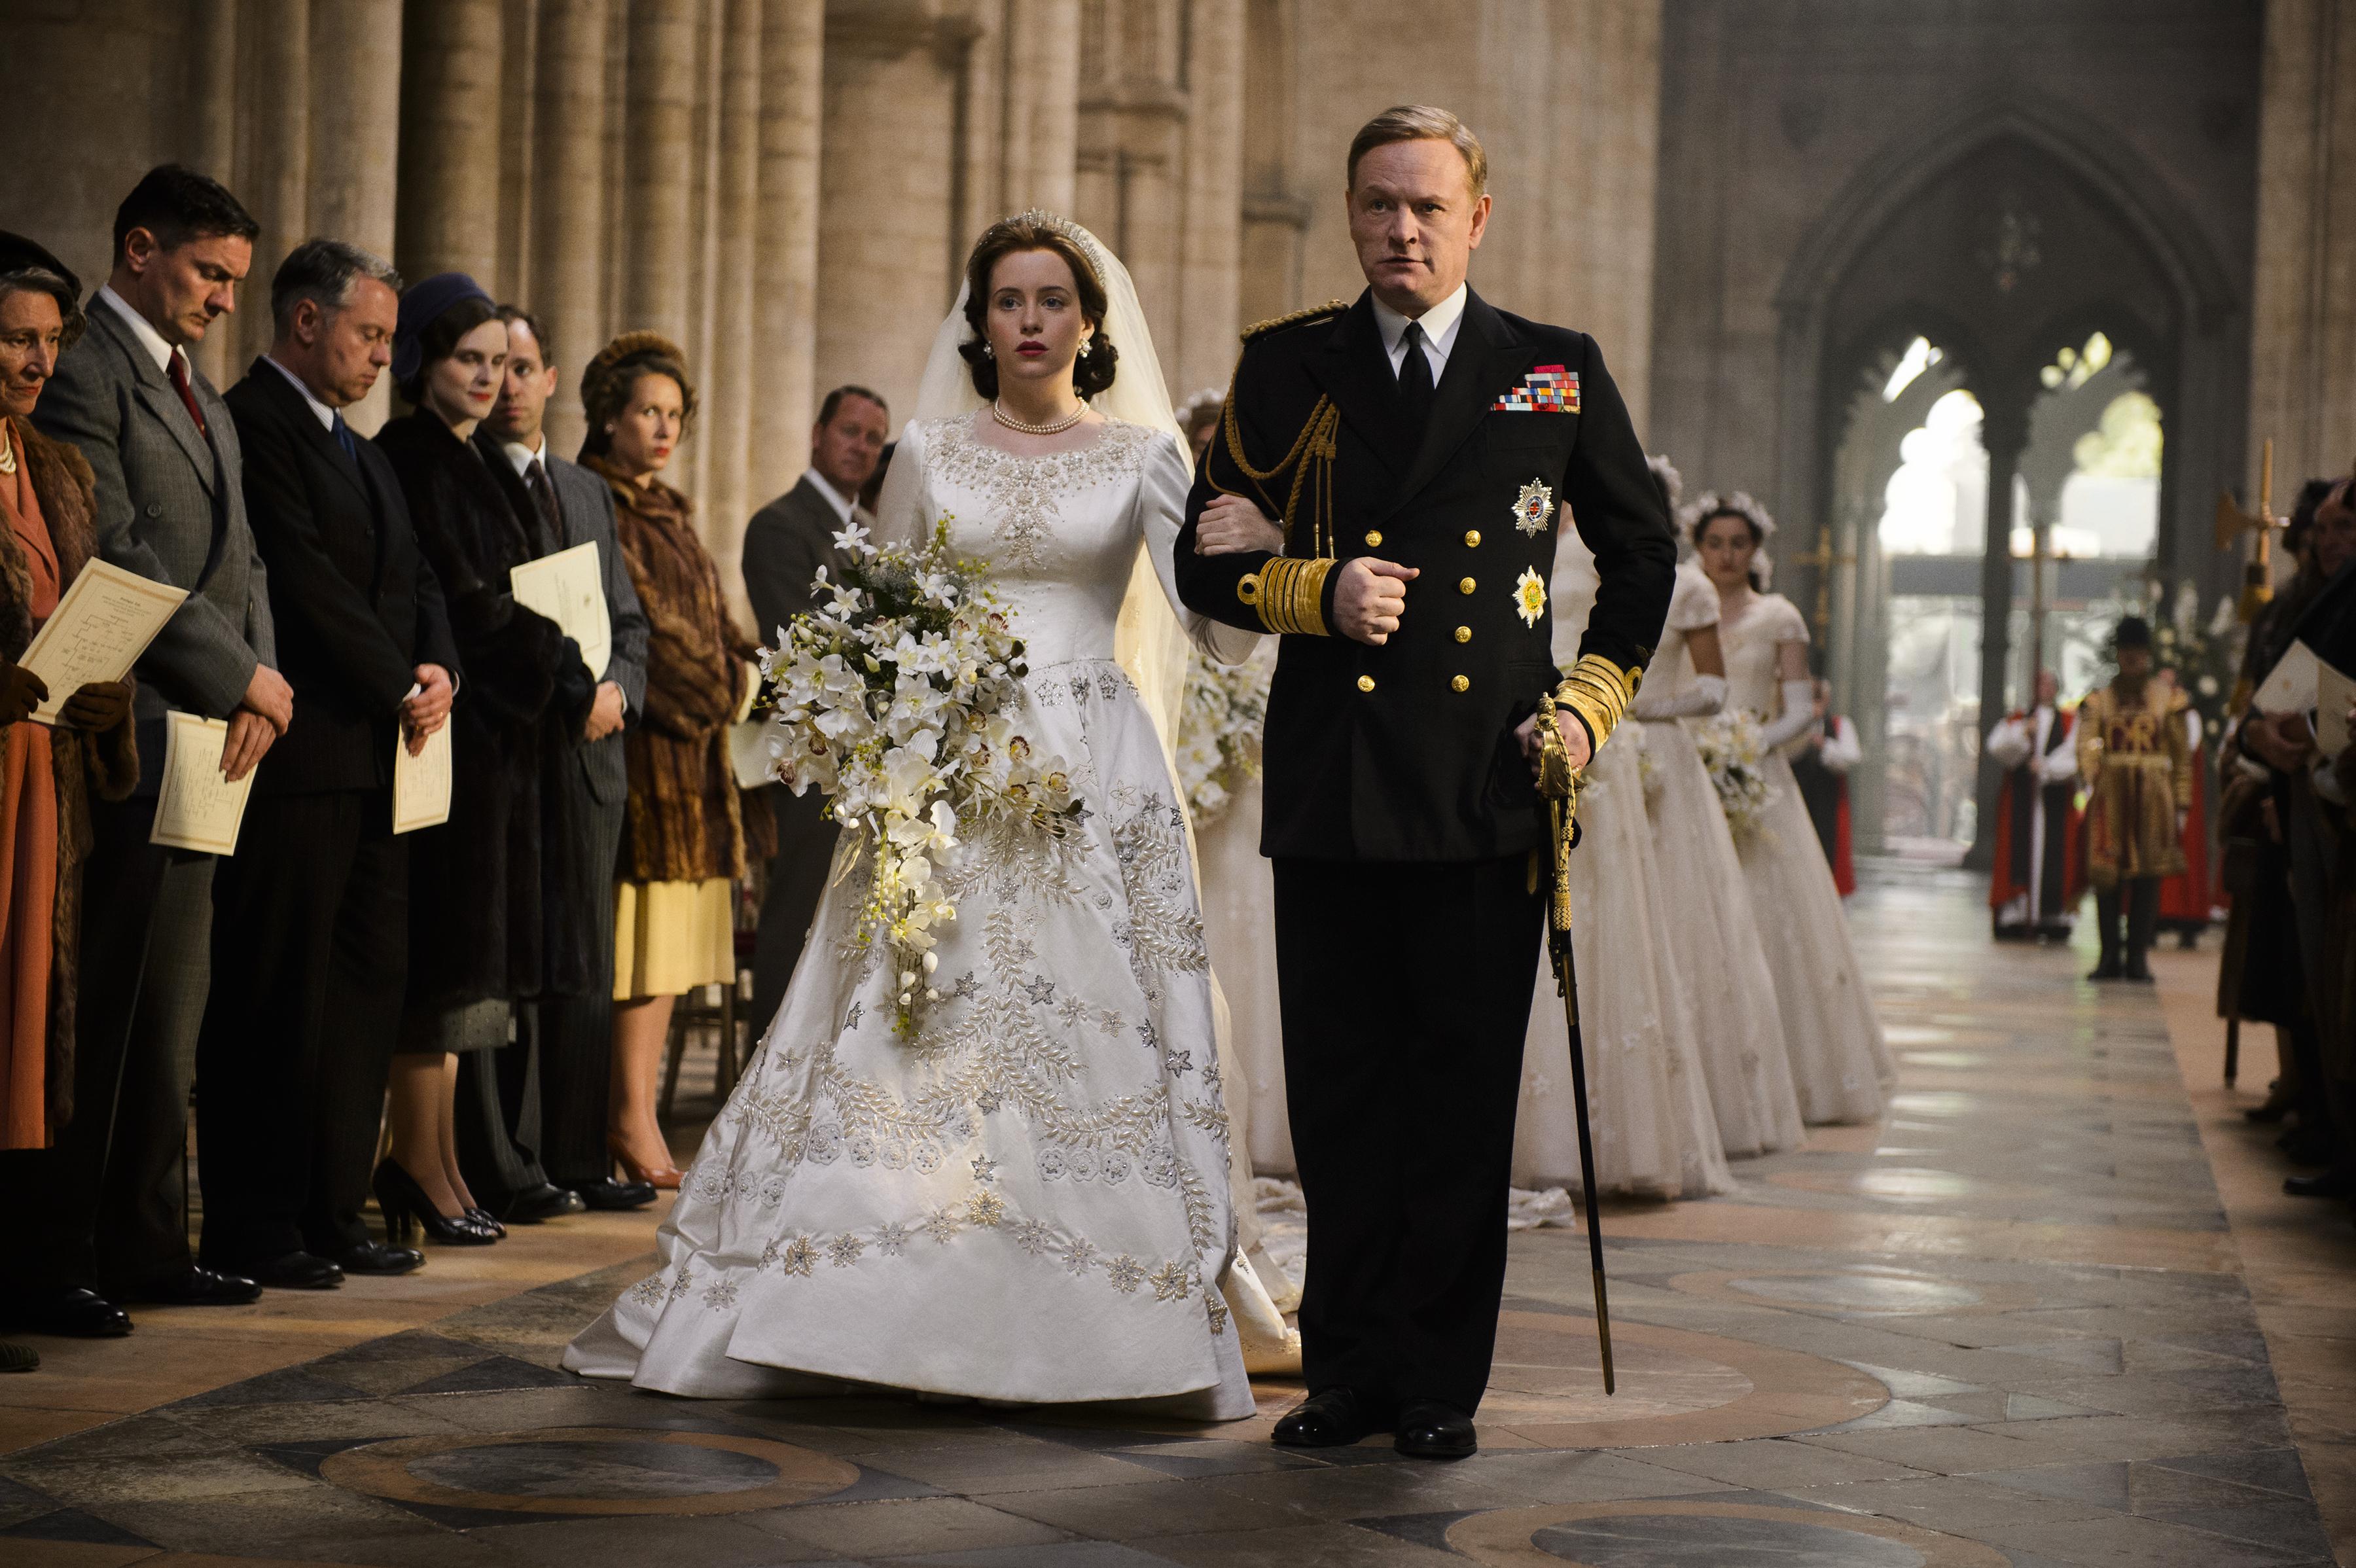 The Crown\' wedding dress cost $47,000 to make - Vogue Australia